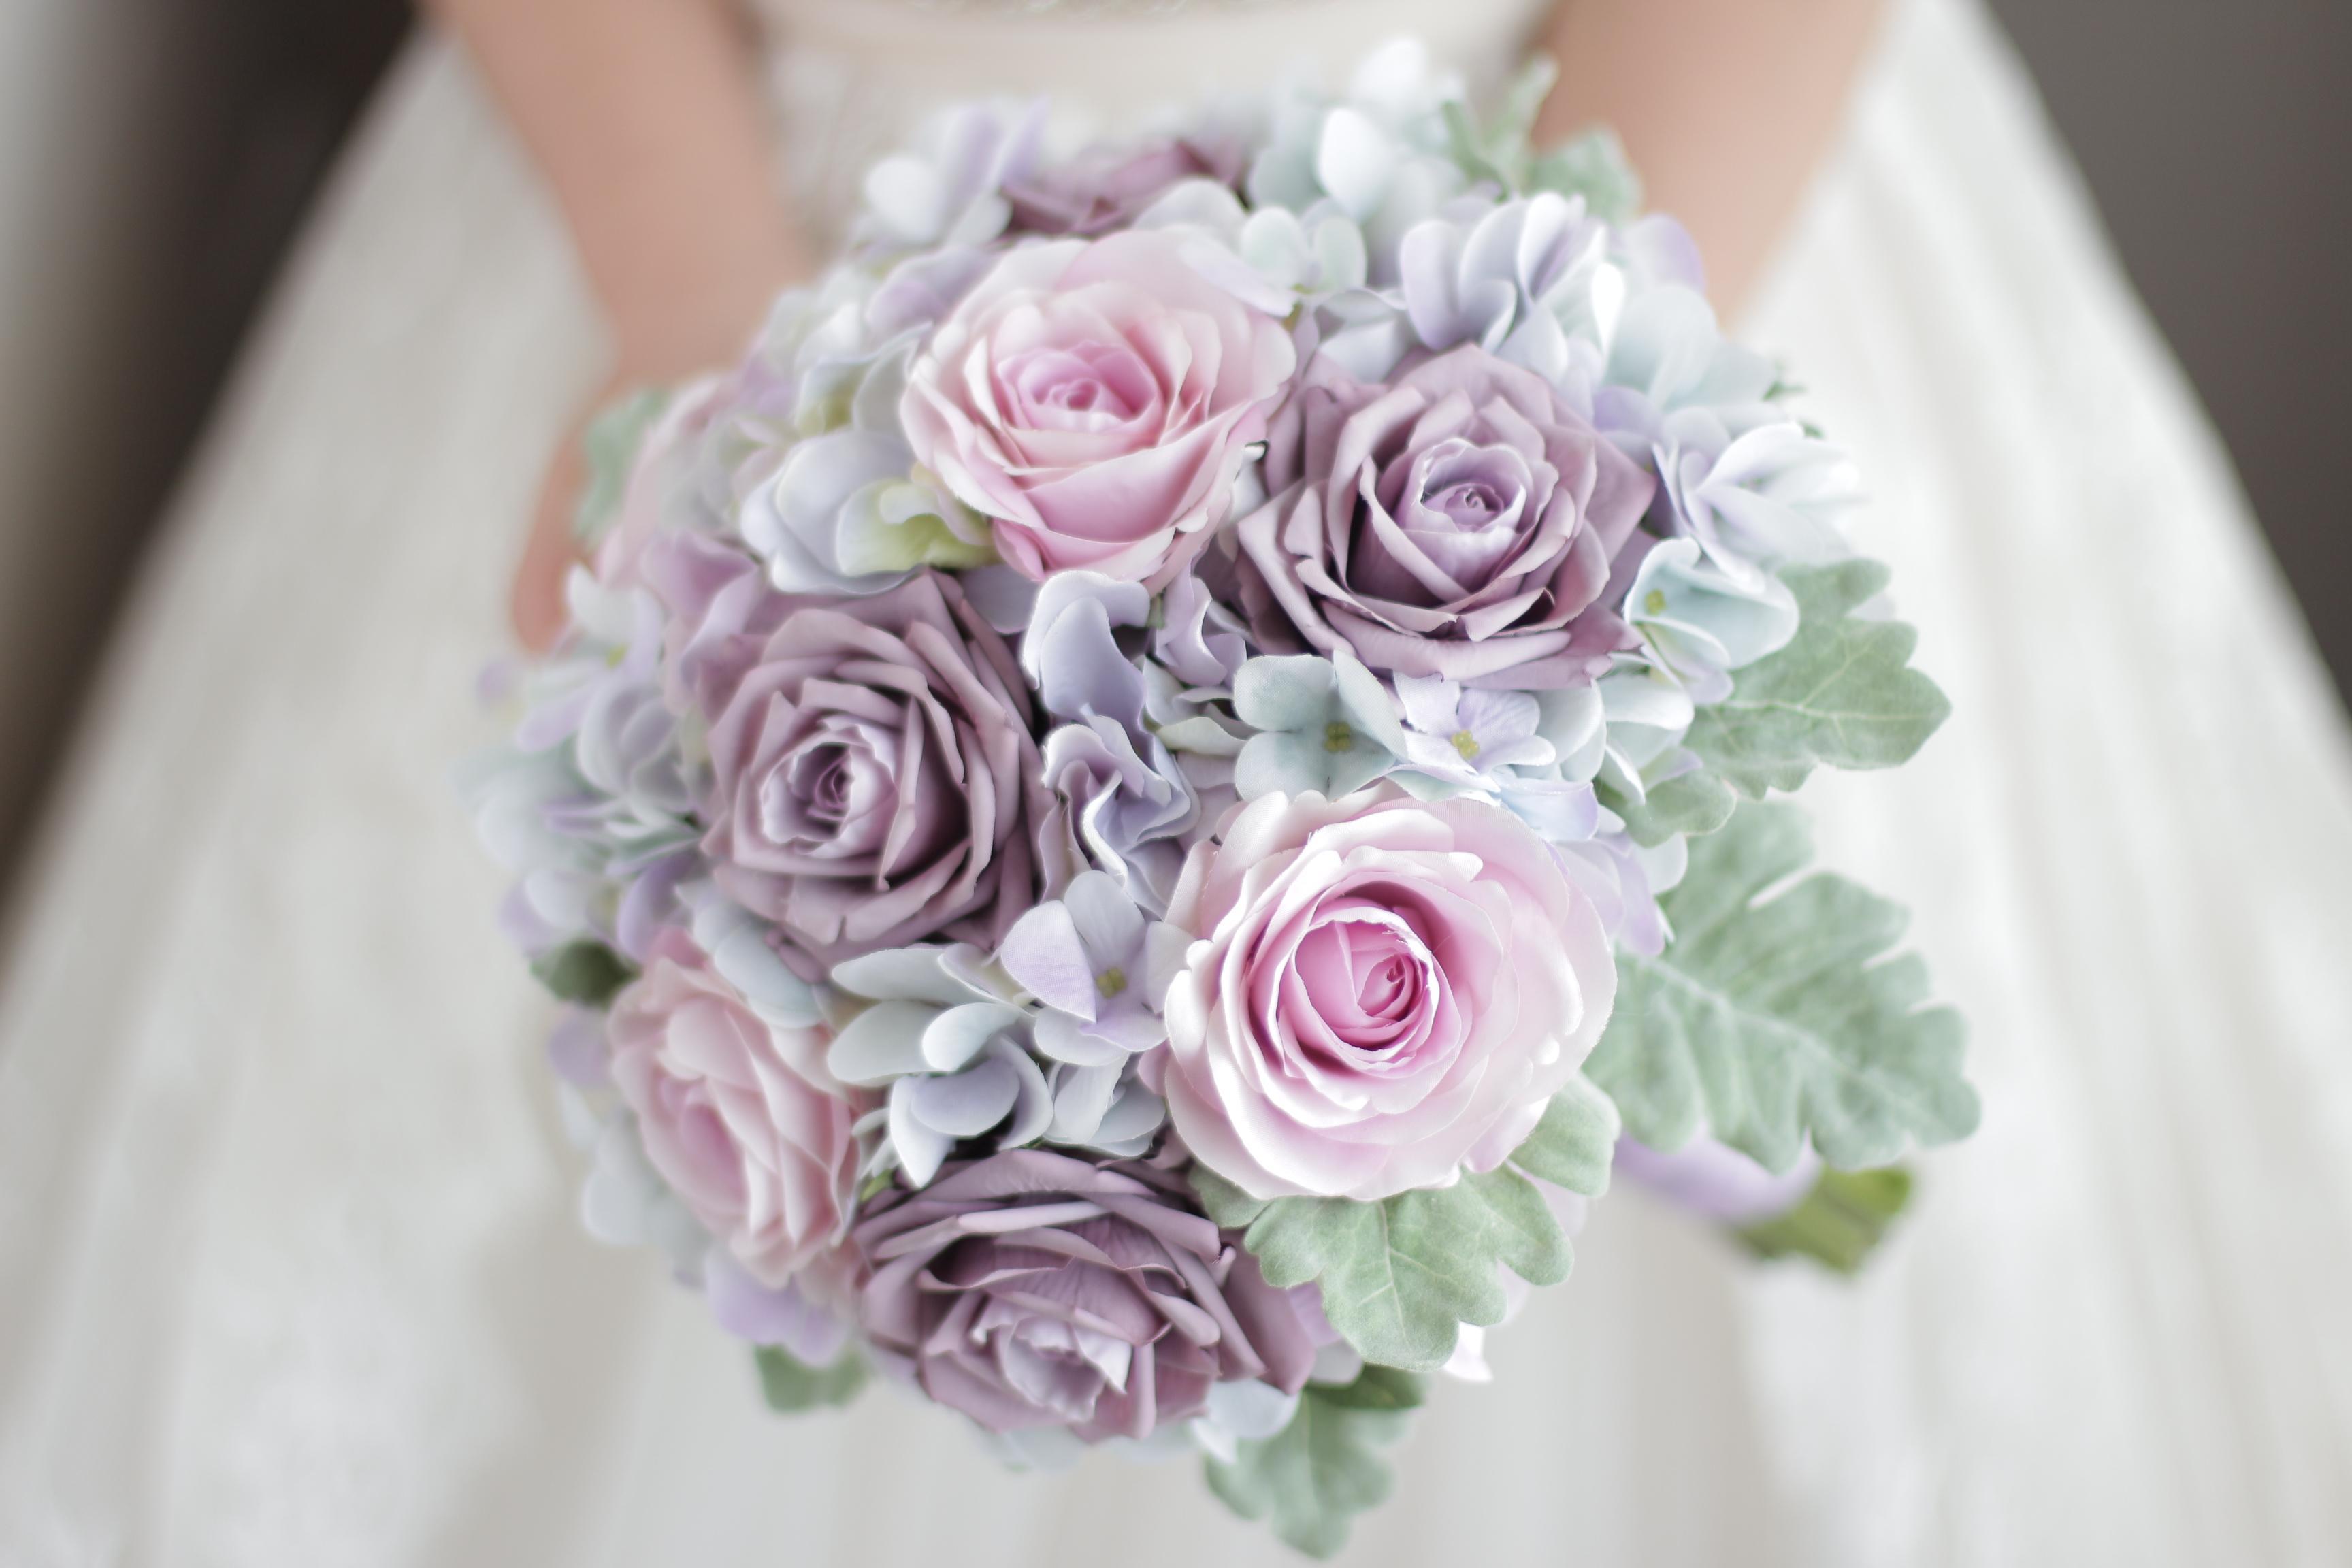 Bouquet Sposa Rose Rosa.Acquista Bouquet Da Sposa Bouquet Da Sposa Bouquet Di Rose Rosa